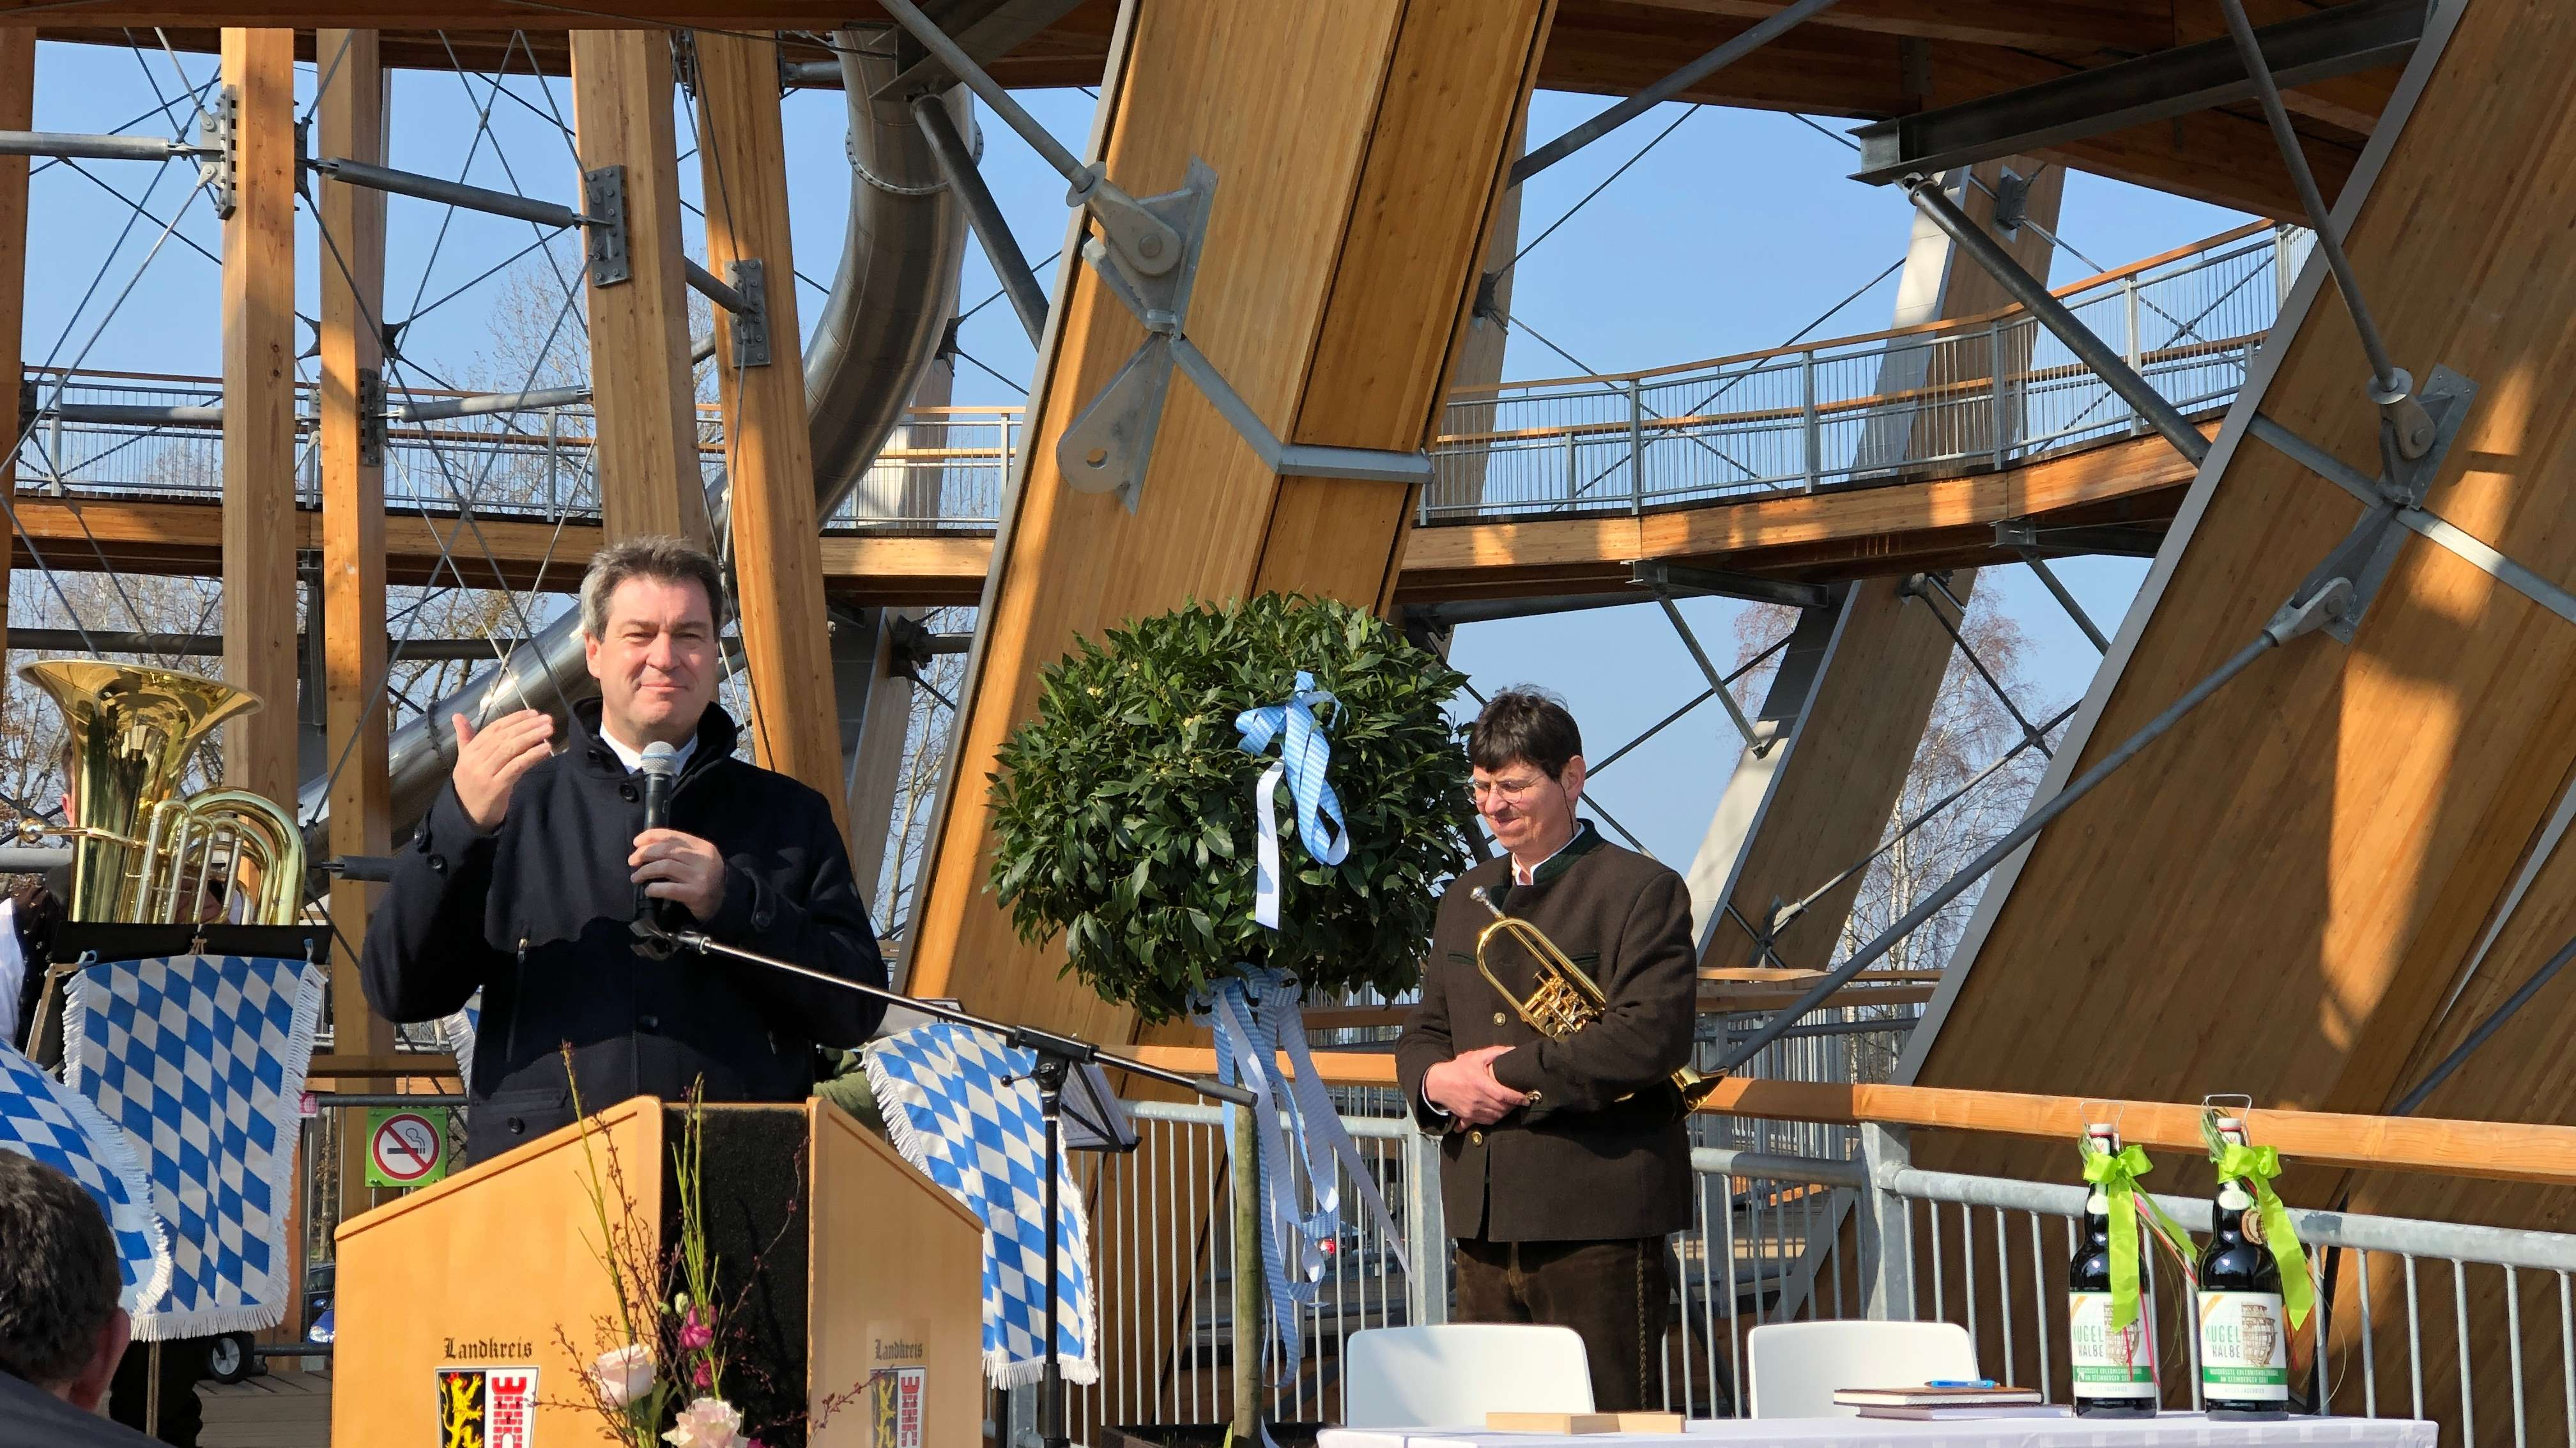 Ministerpräsident Söder eröffnet die Erlebnis-Holzkugel